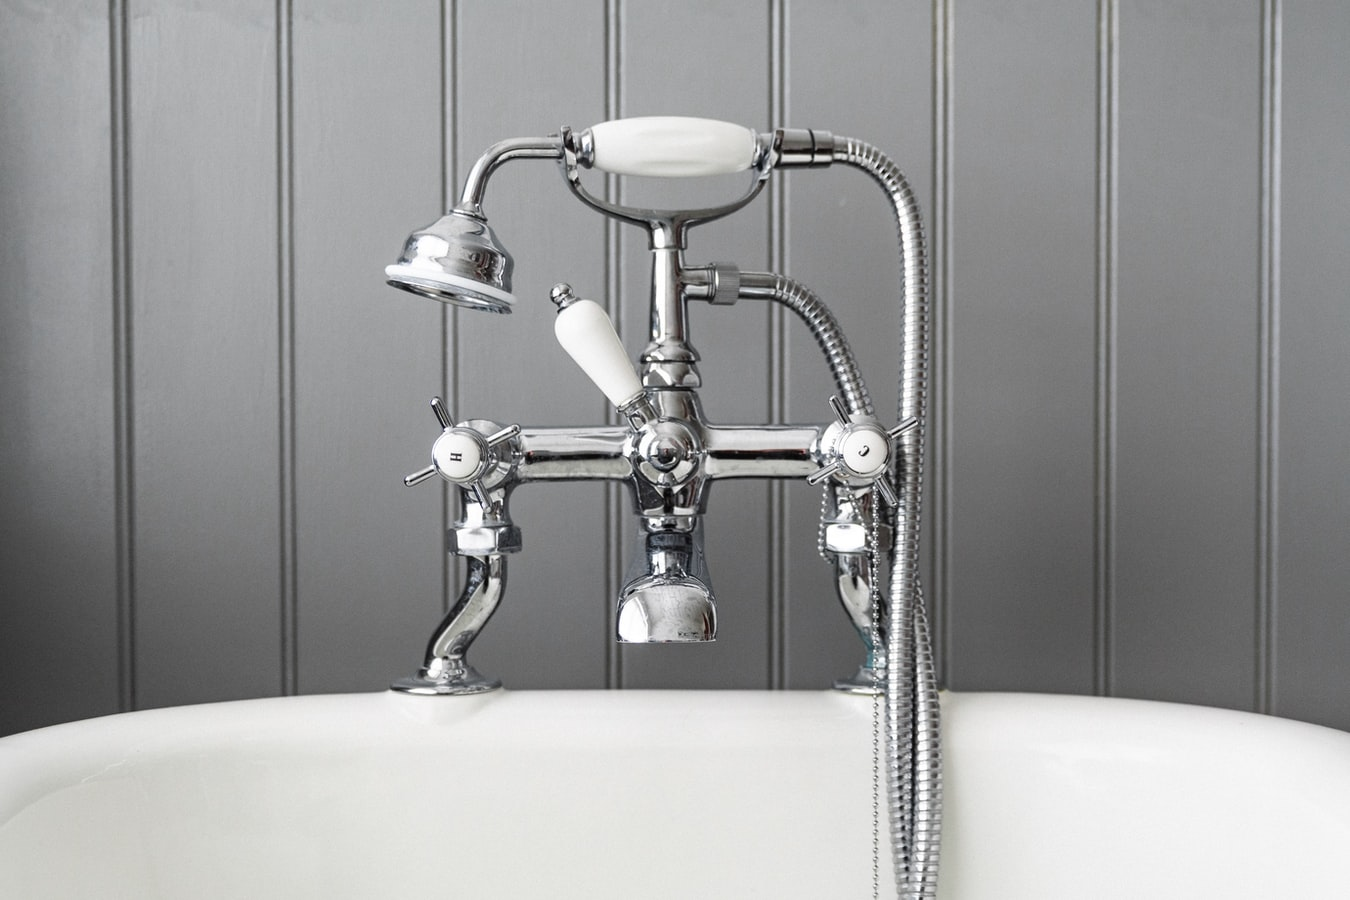 Plumbing Bathrooms and Kitchens